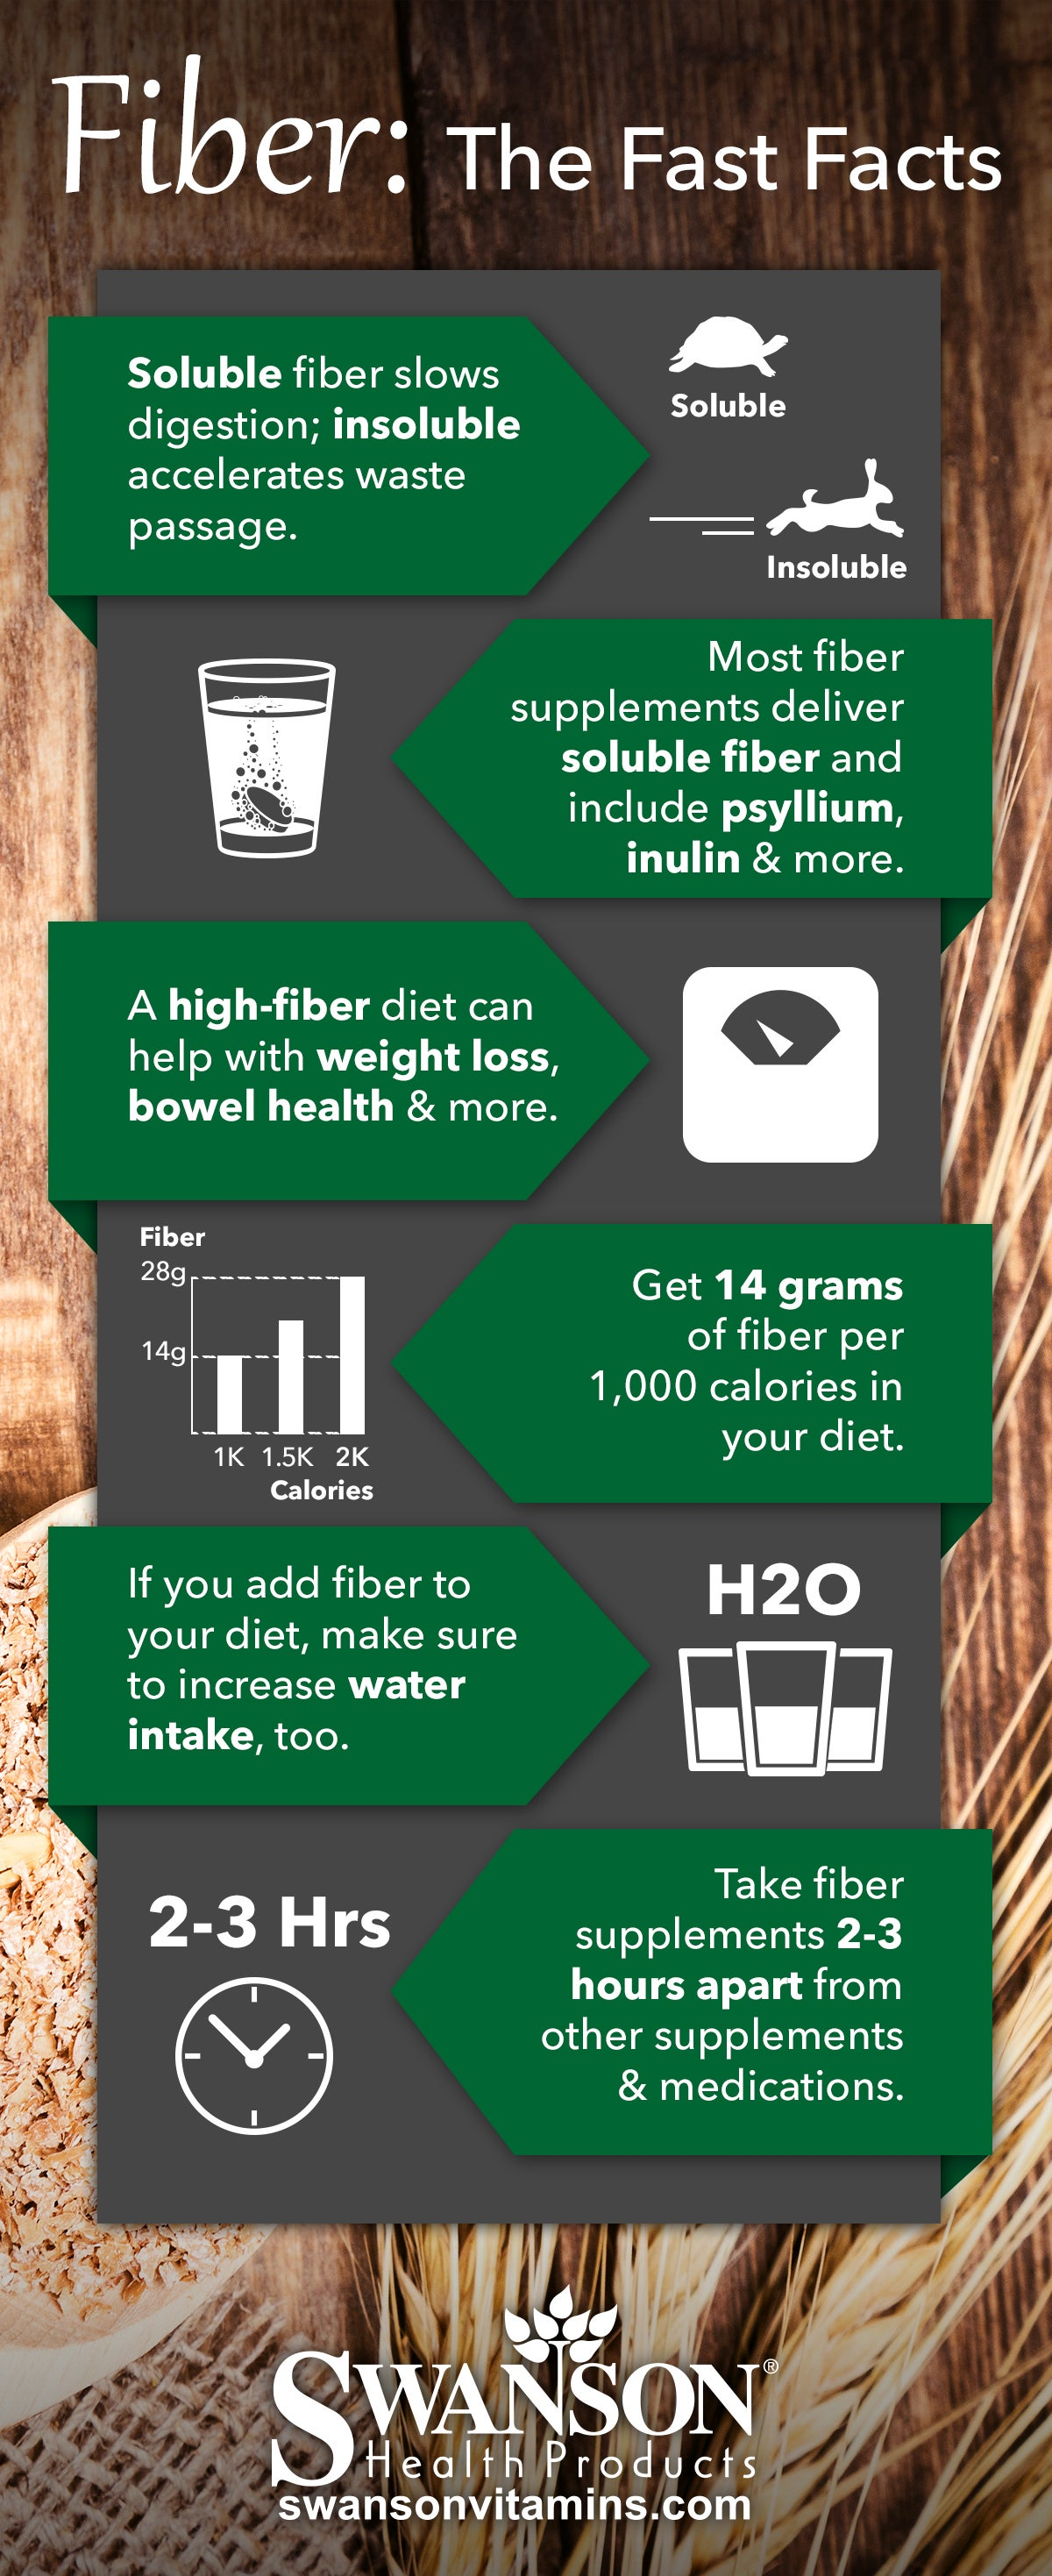 Fiber Supplement Infographic: Nutrition, Dosage and Benefits